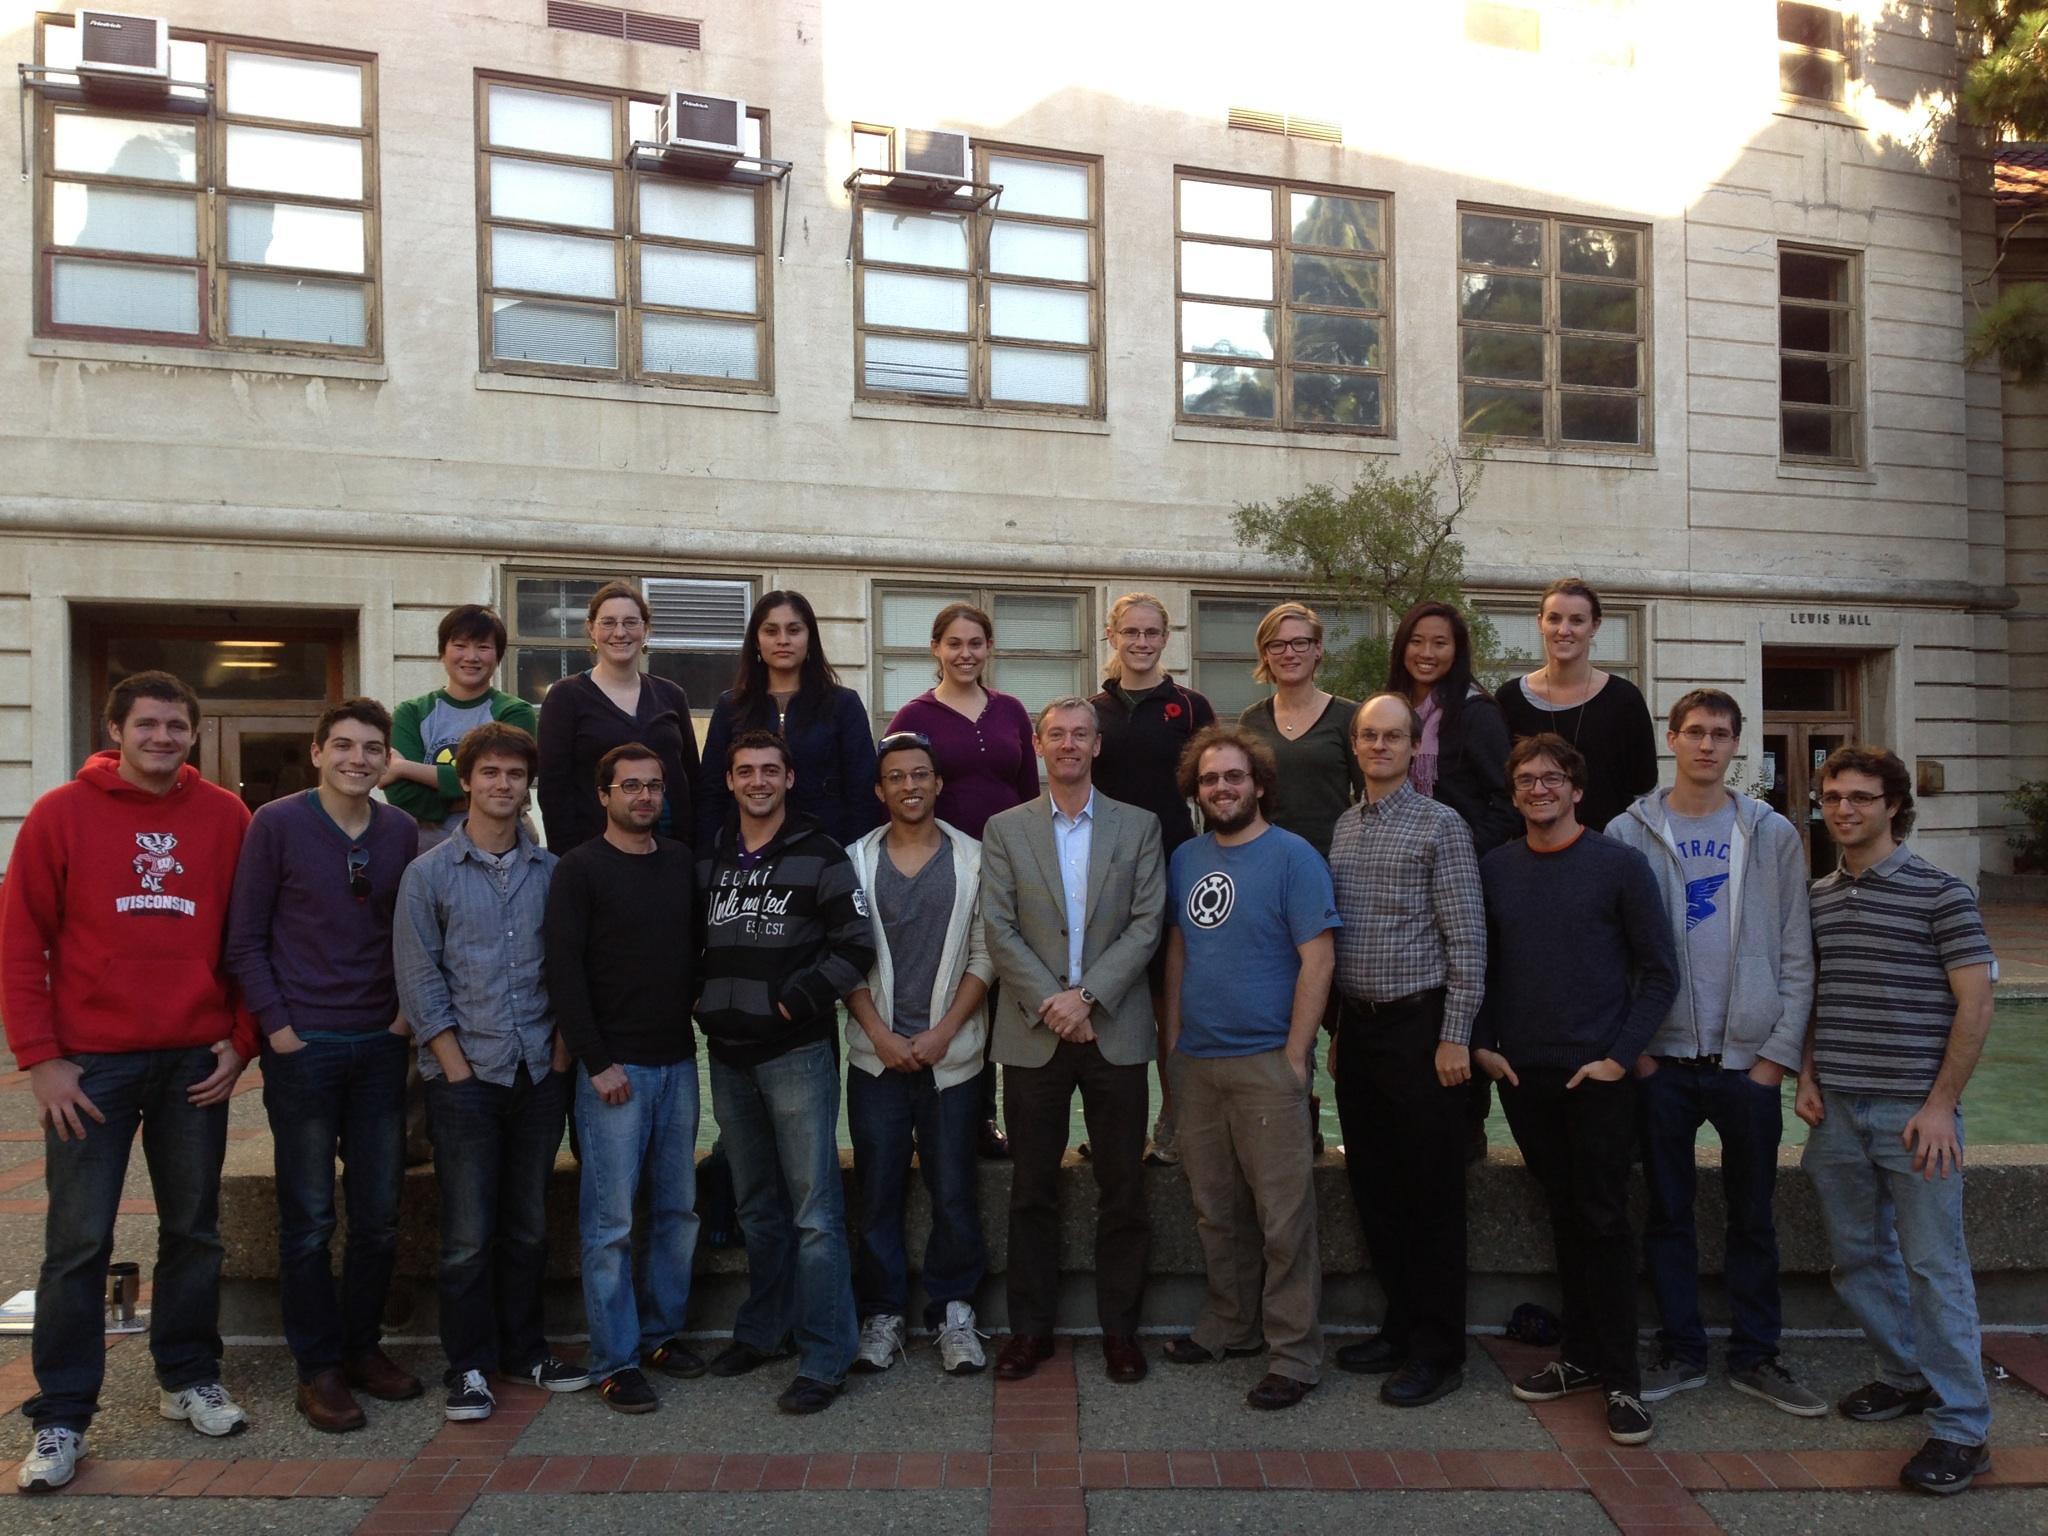 Arnold group Nov 2012.jpeg